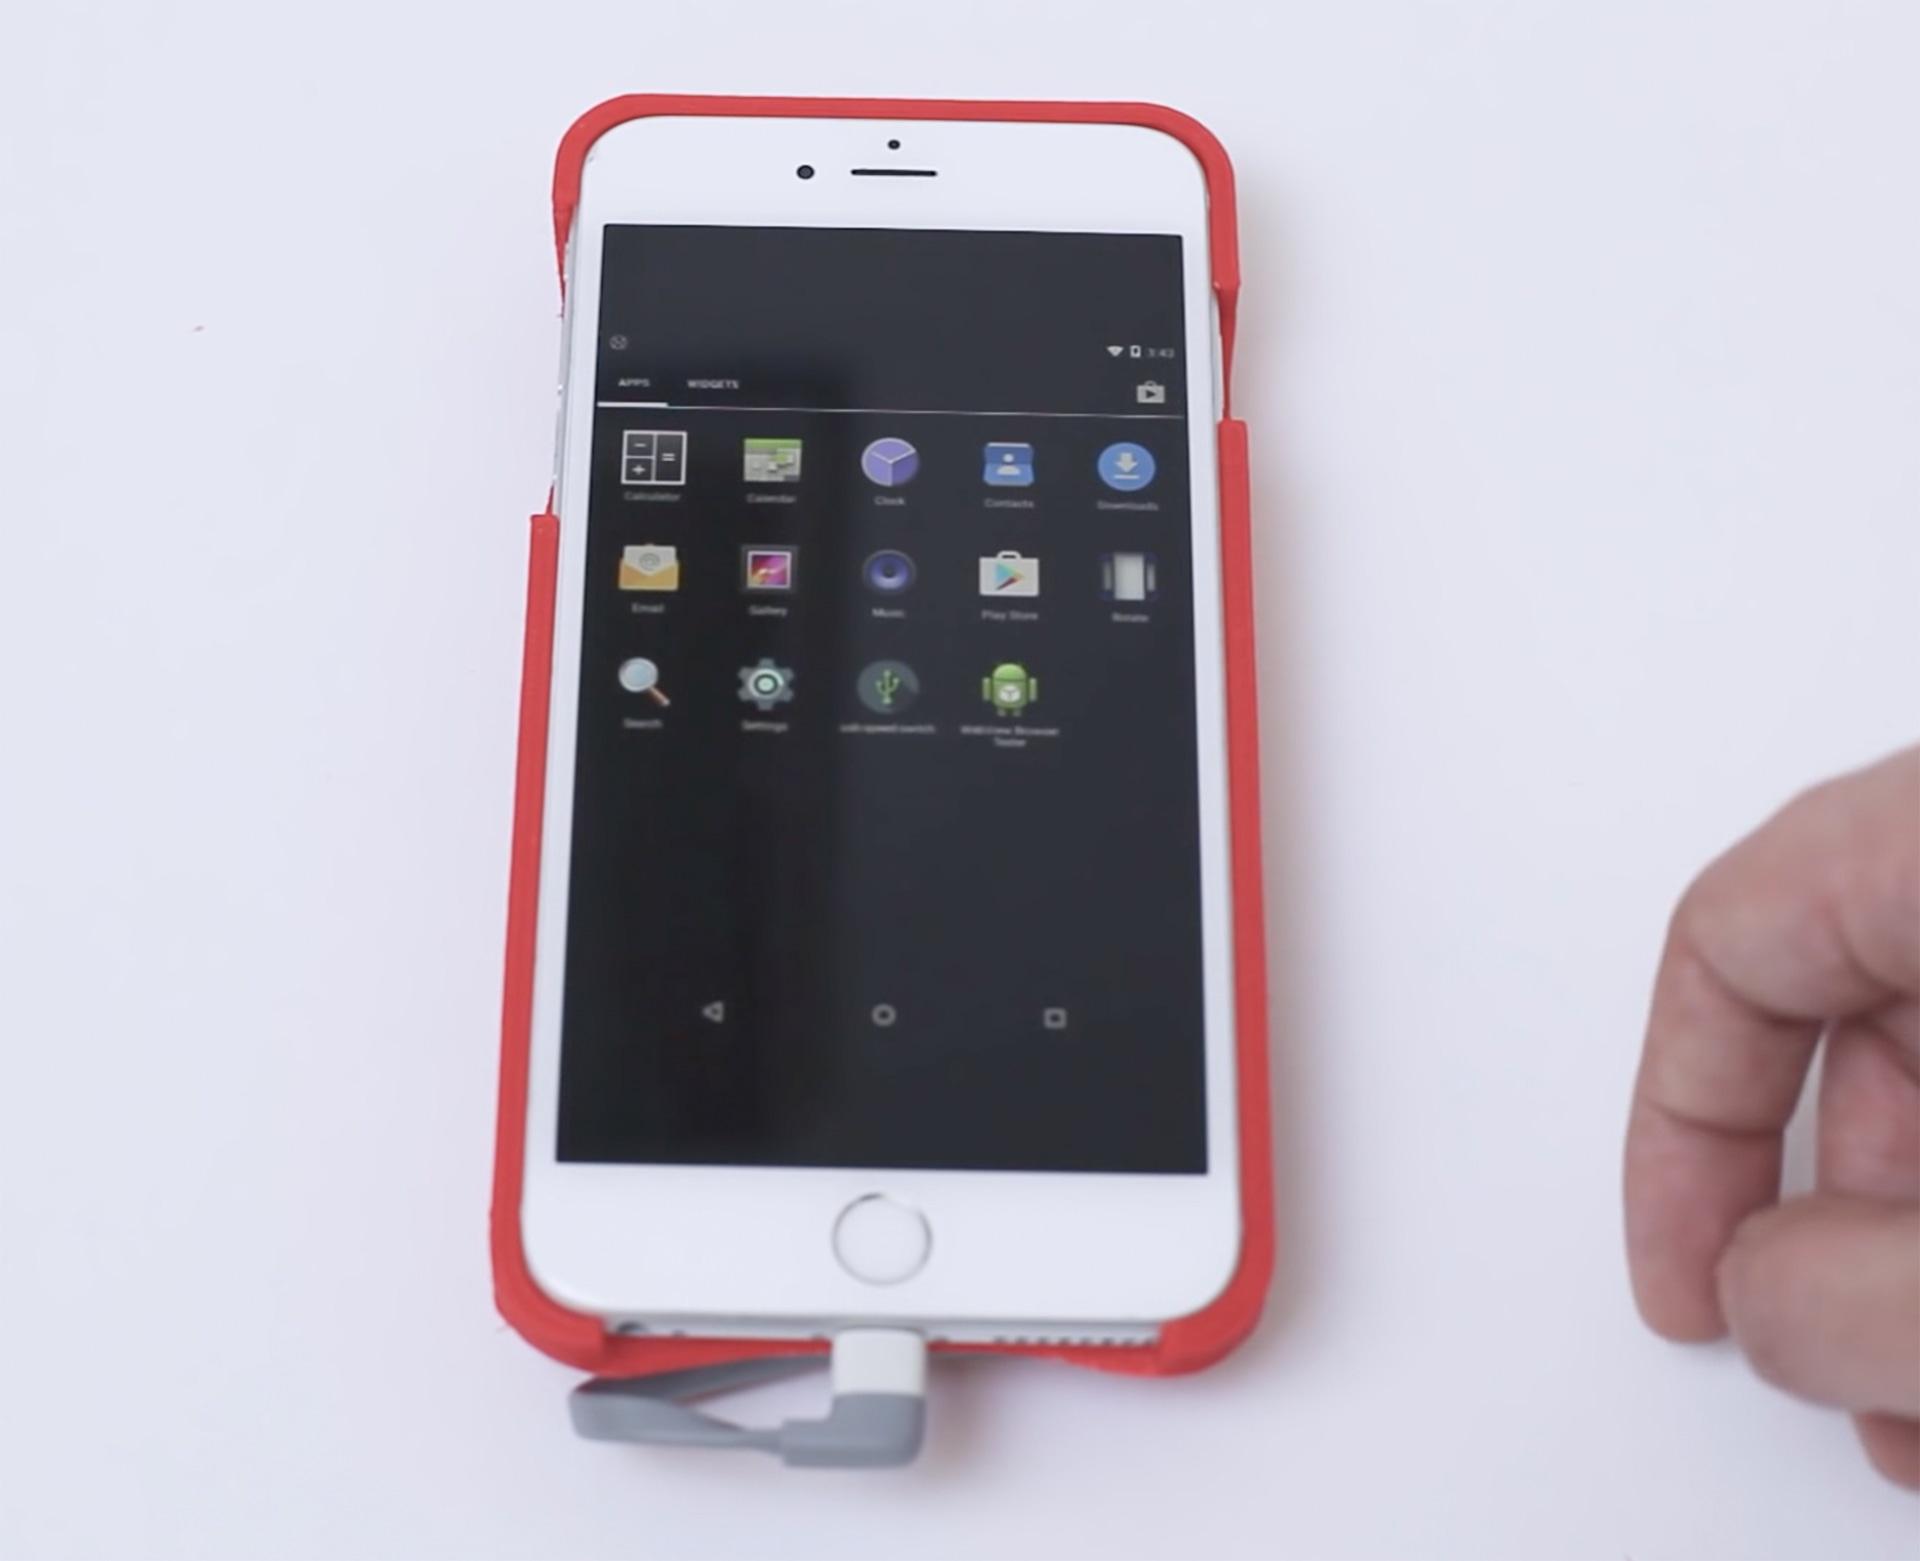 iPhone rodando Android